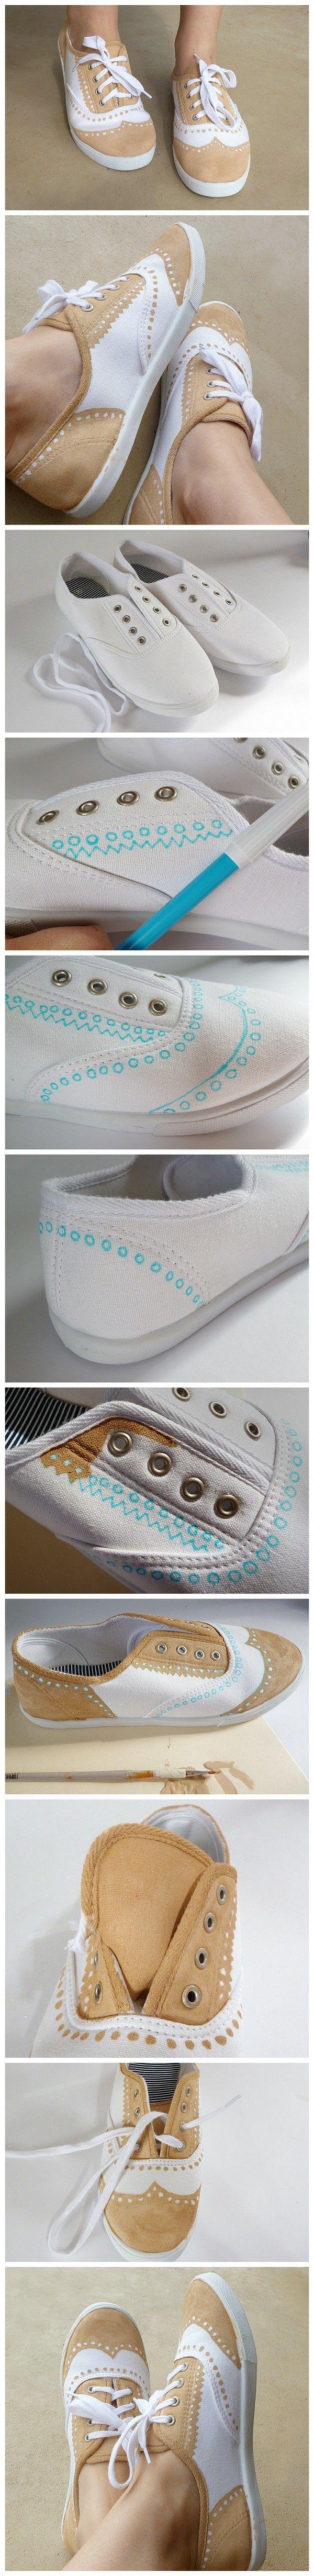 oxford diy sneakers